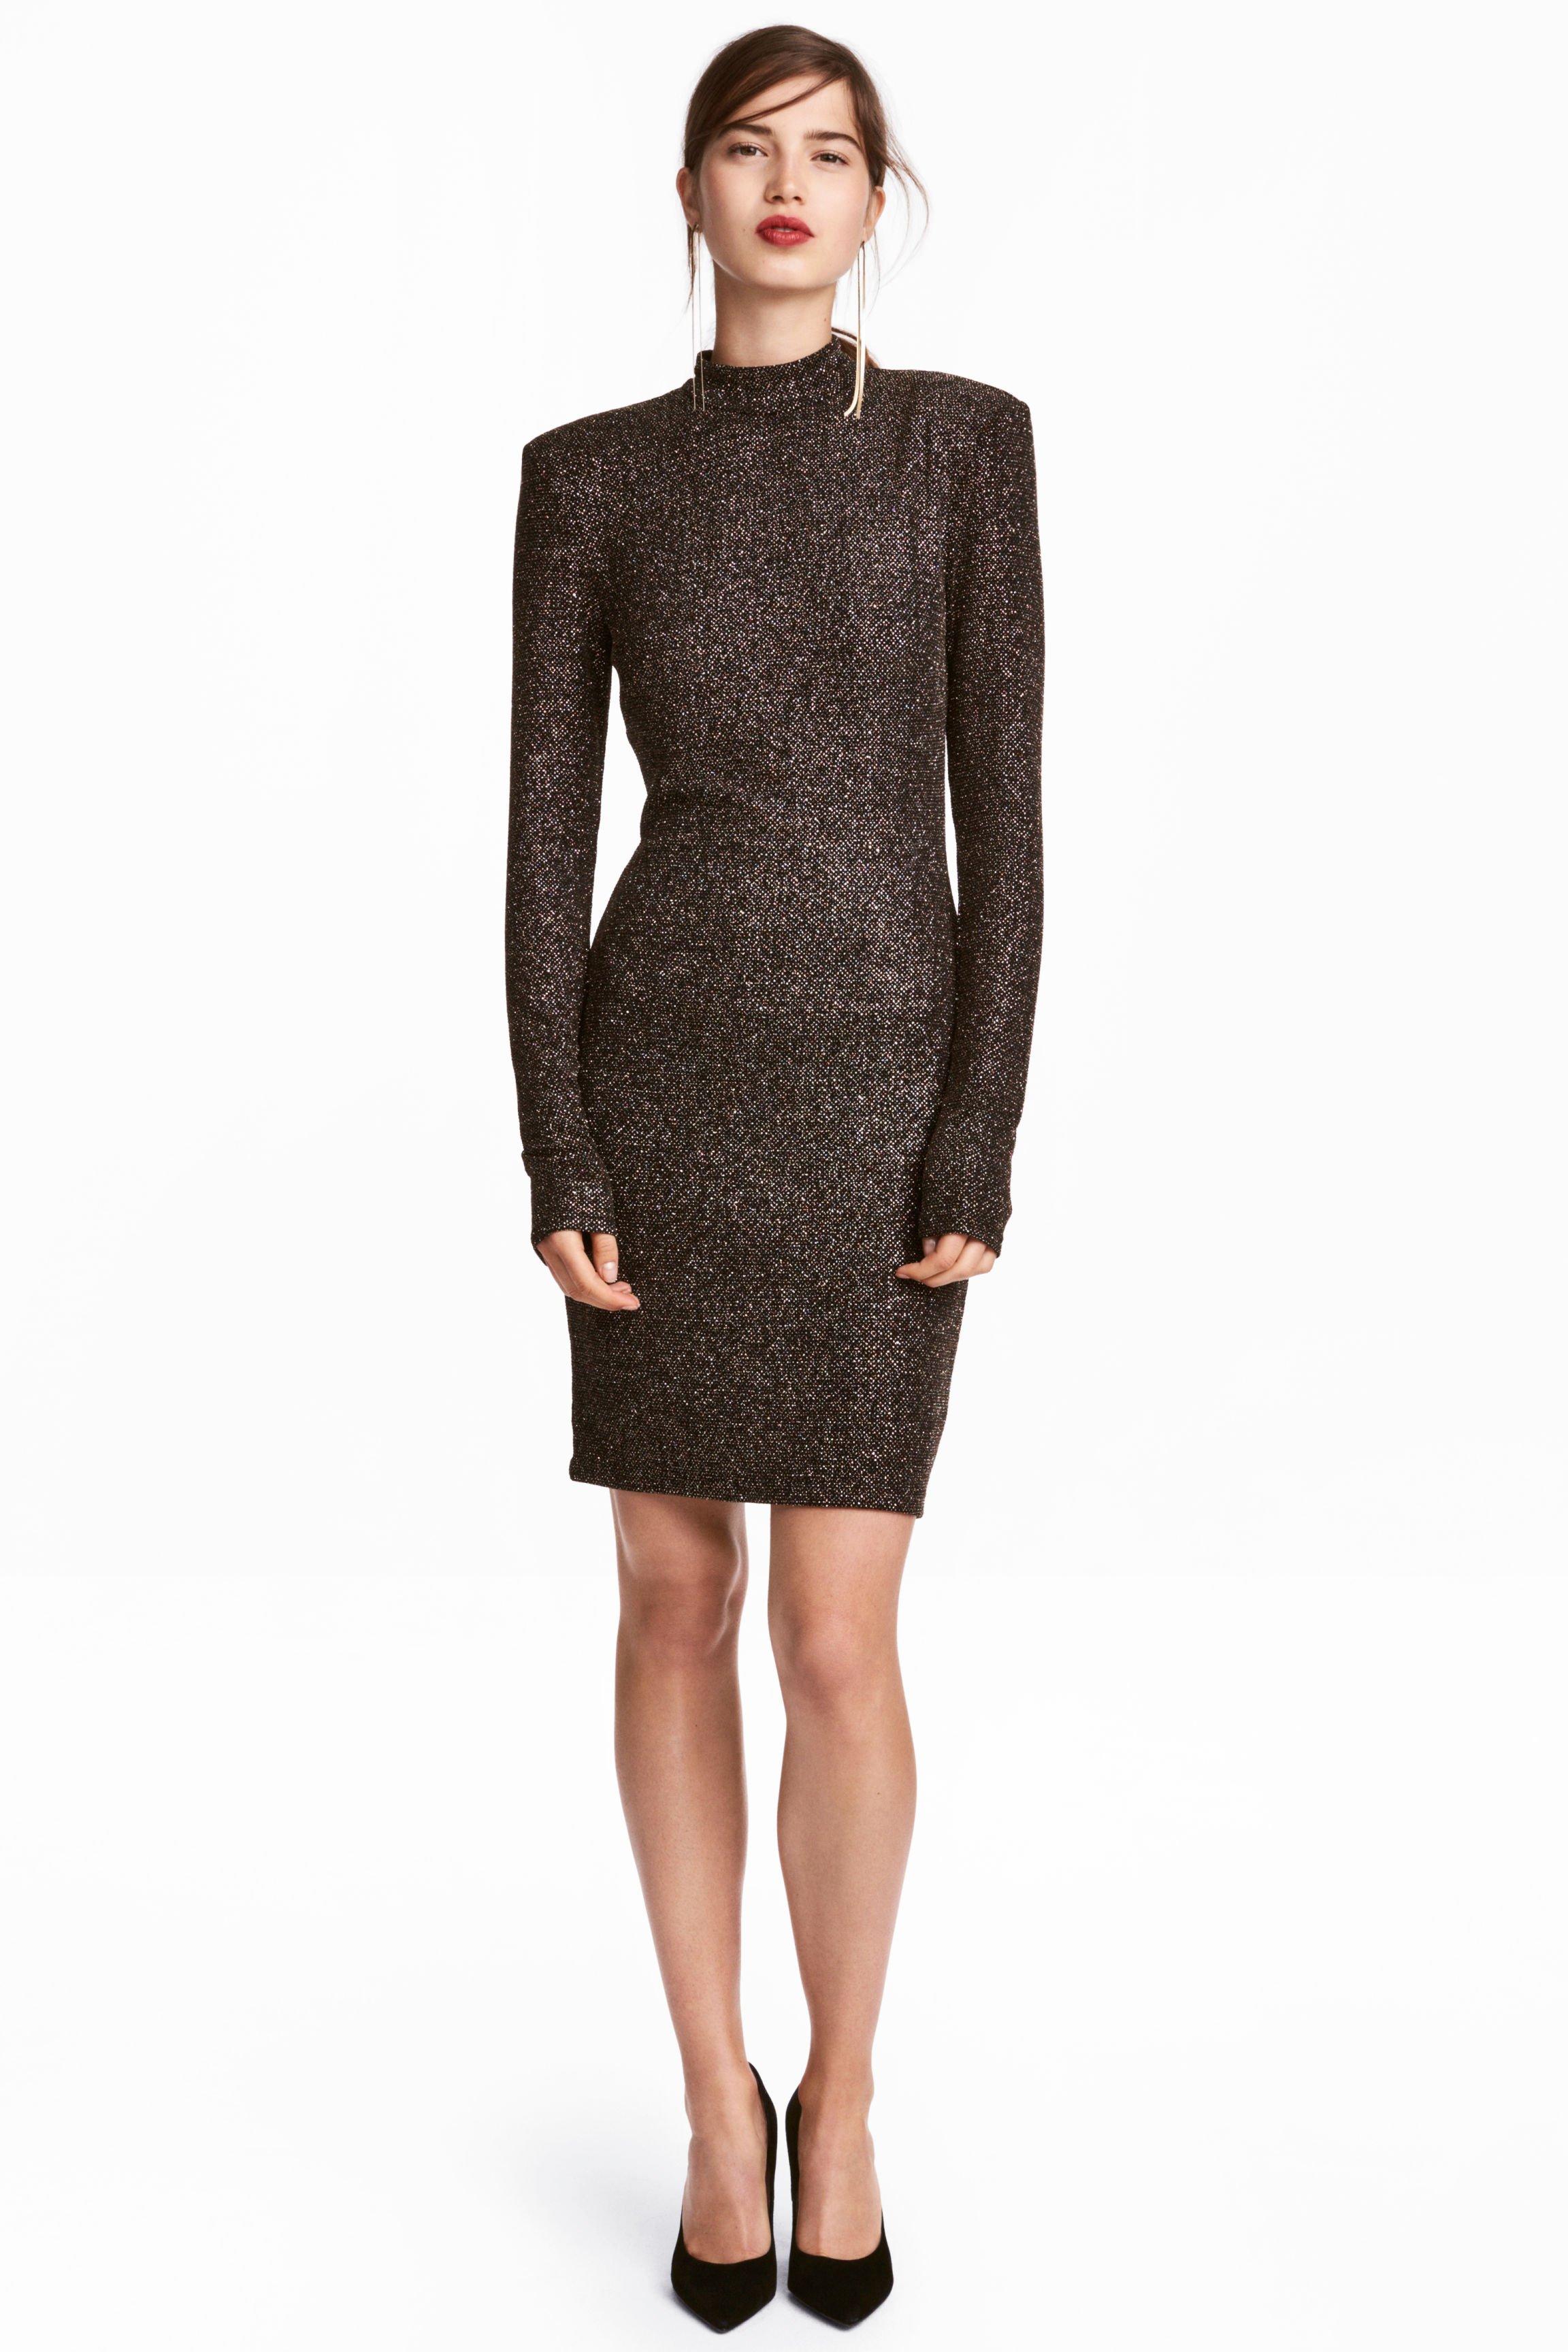 H M Glittery Black Dress